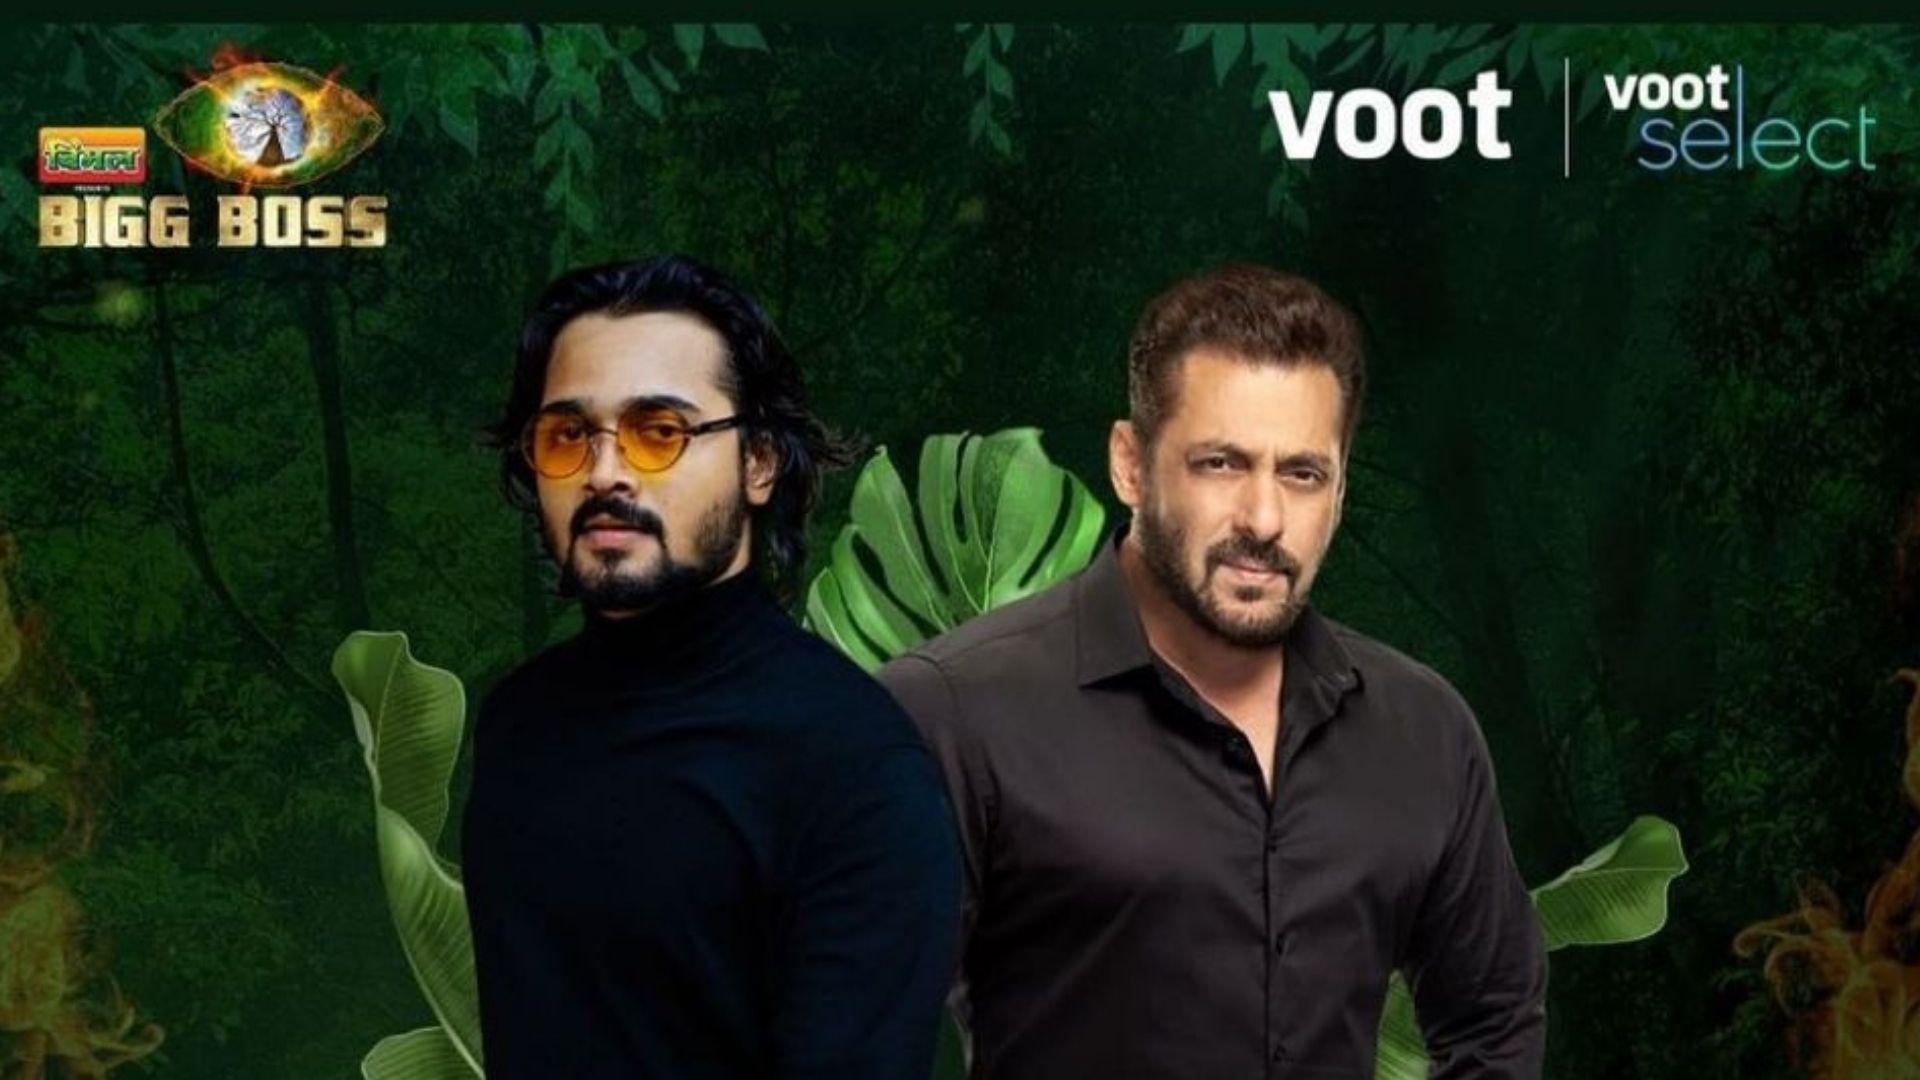 Bigg Boss 15 Weekend Ka Vaar: YouTuber Bhuvan Bam To Grace The Stage With Salman Khan; Fans Get Excited